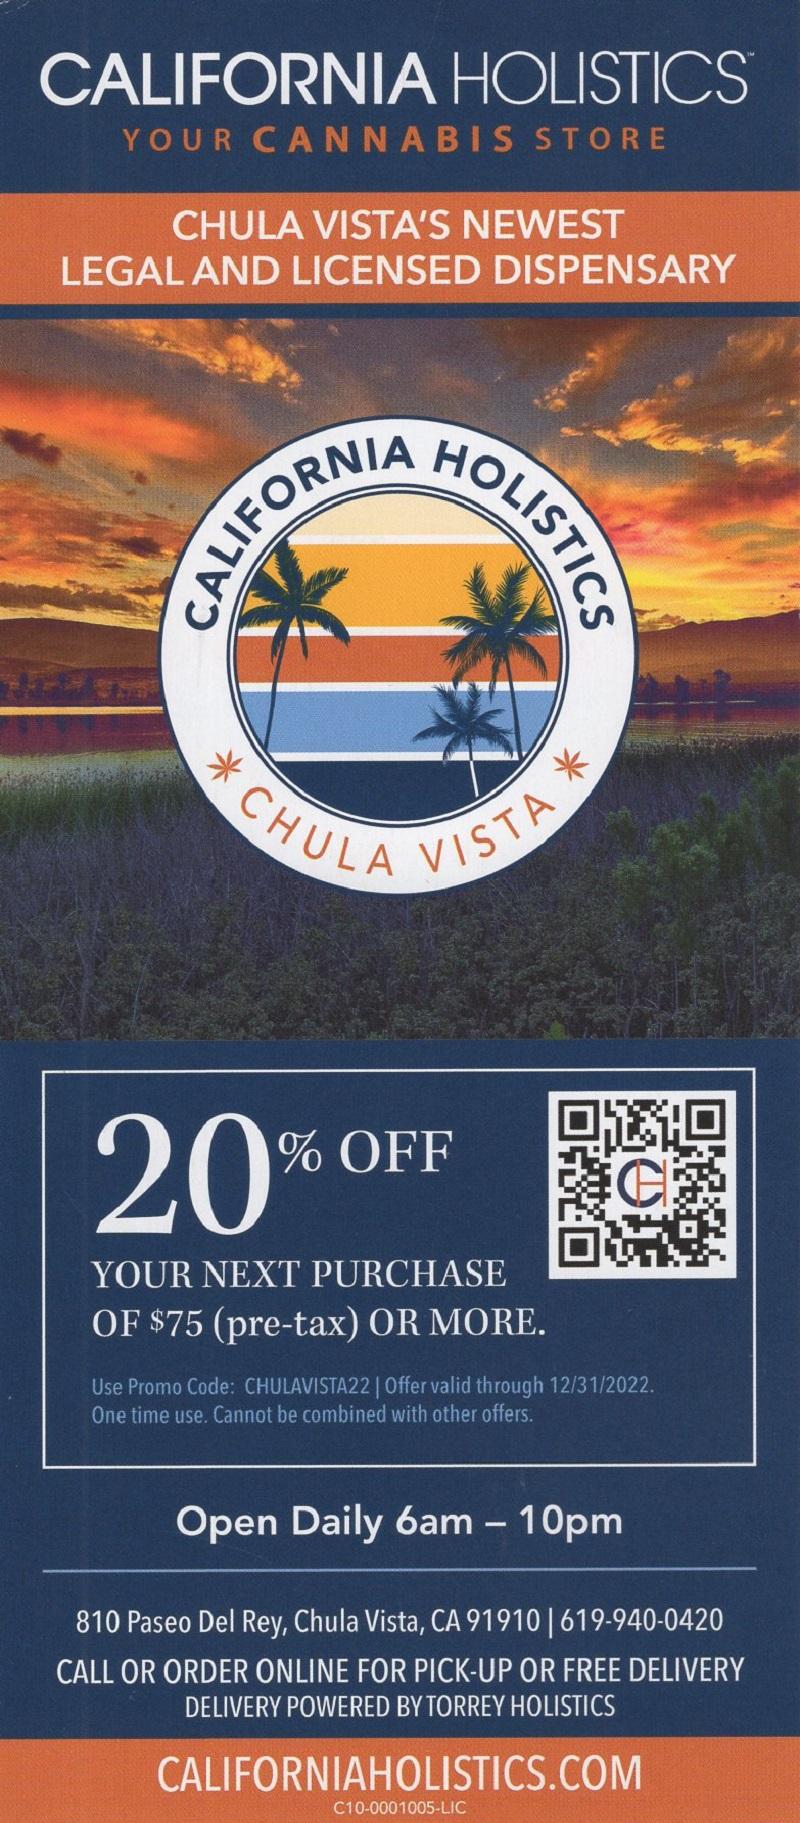 Torrey Holistics brochure thumbnail